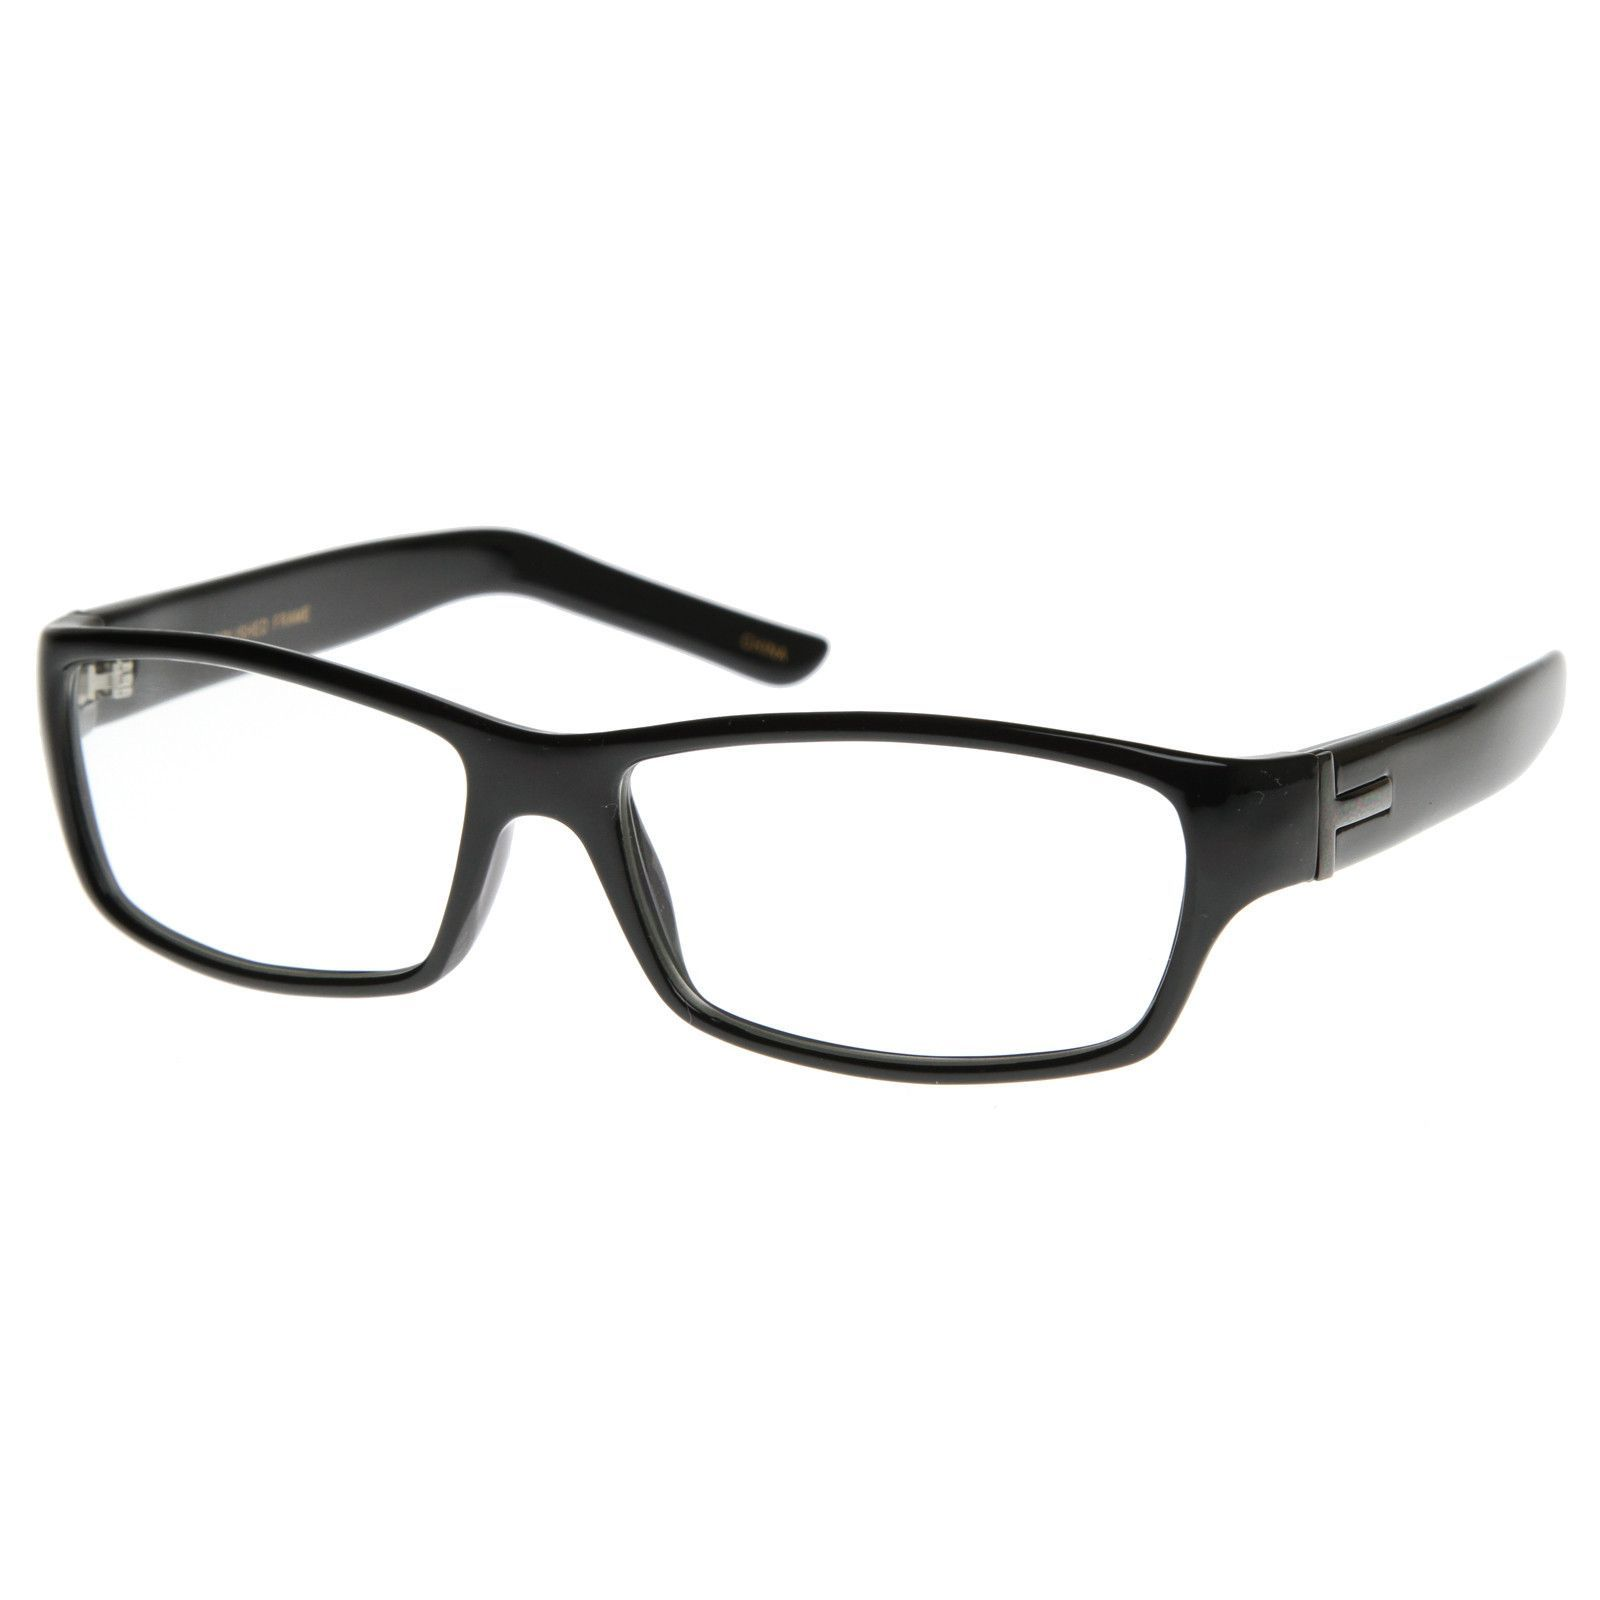 eb4821d2667 Classic European Designer Optical Clear Lens Glasses 2948 ...